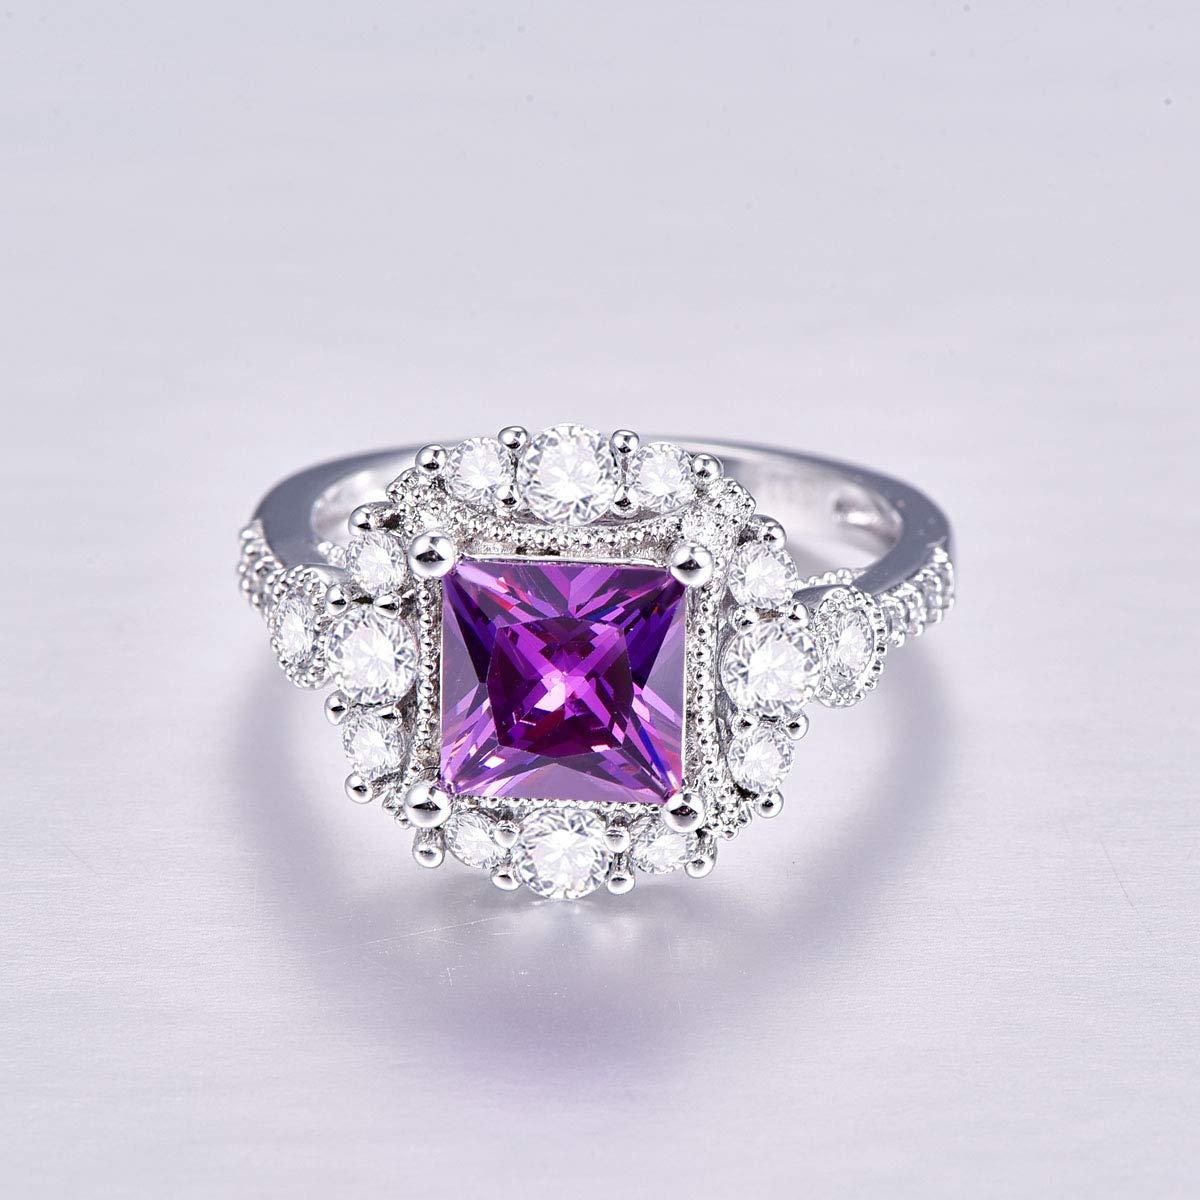 PAKULA 925 Sterling Silver Women Princess Cut Simulated Amethyst Halo Engagement Ring